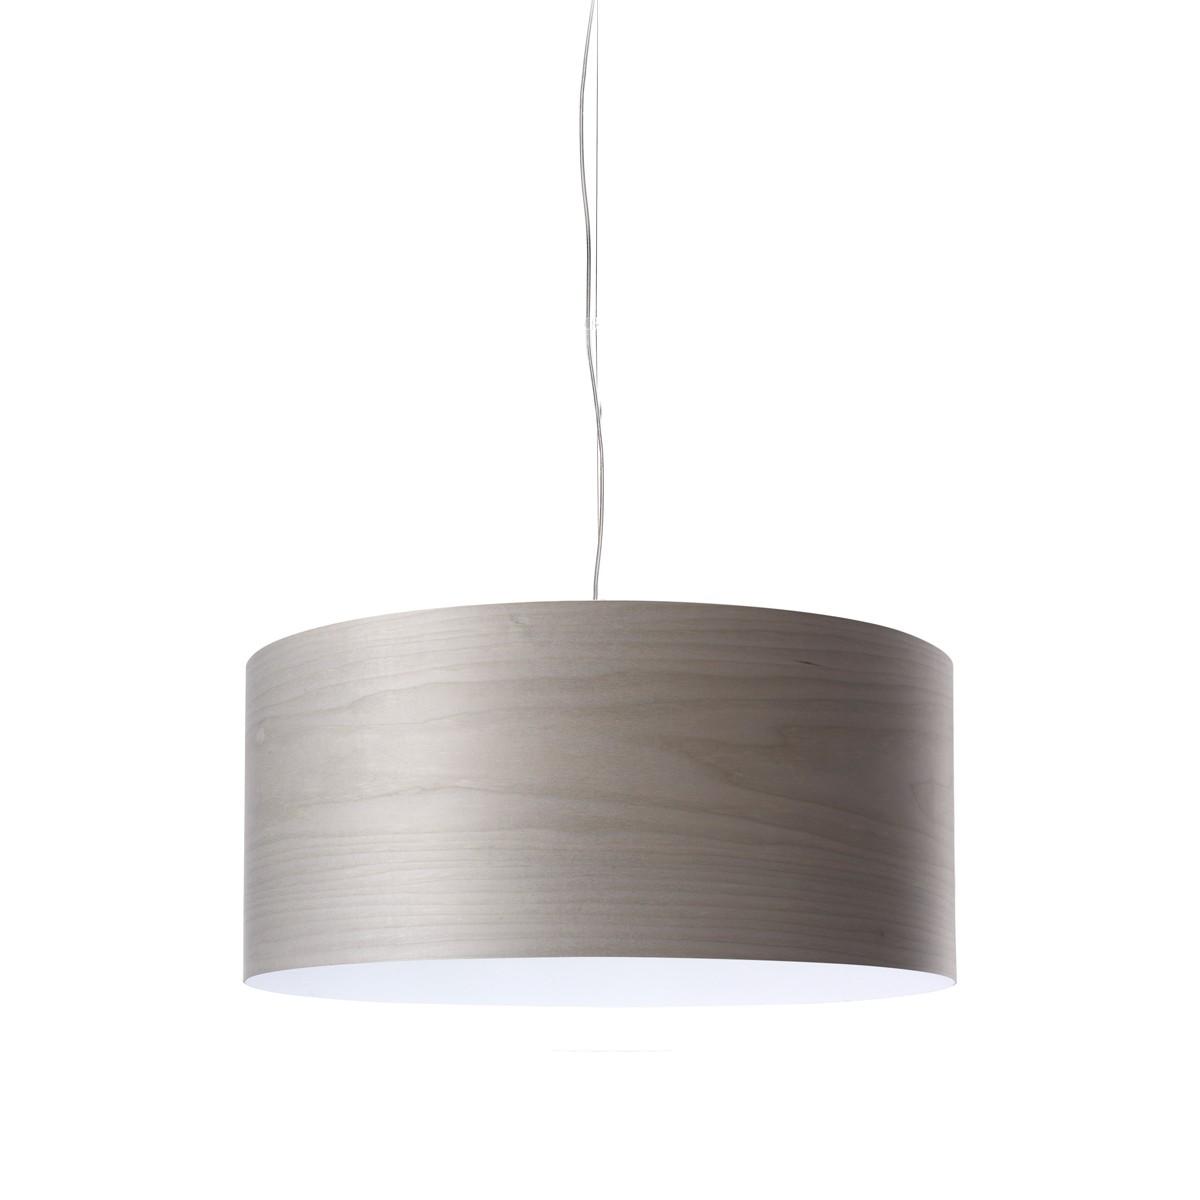 LZF Lamps Gea Small Pendelleuchte, grau